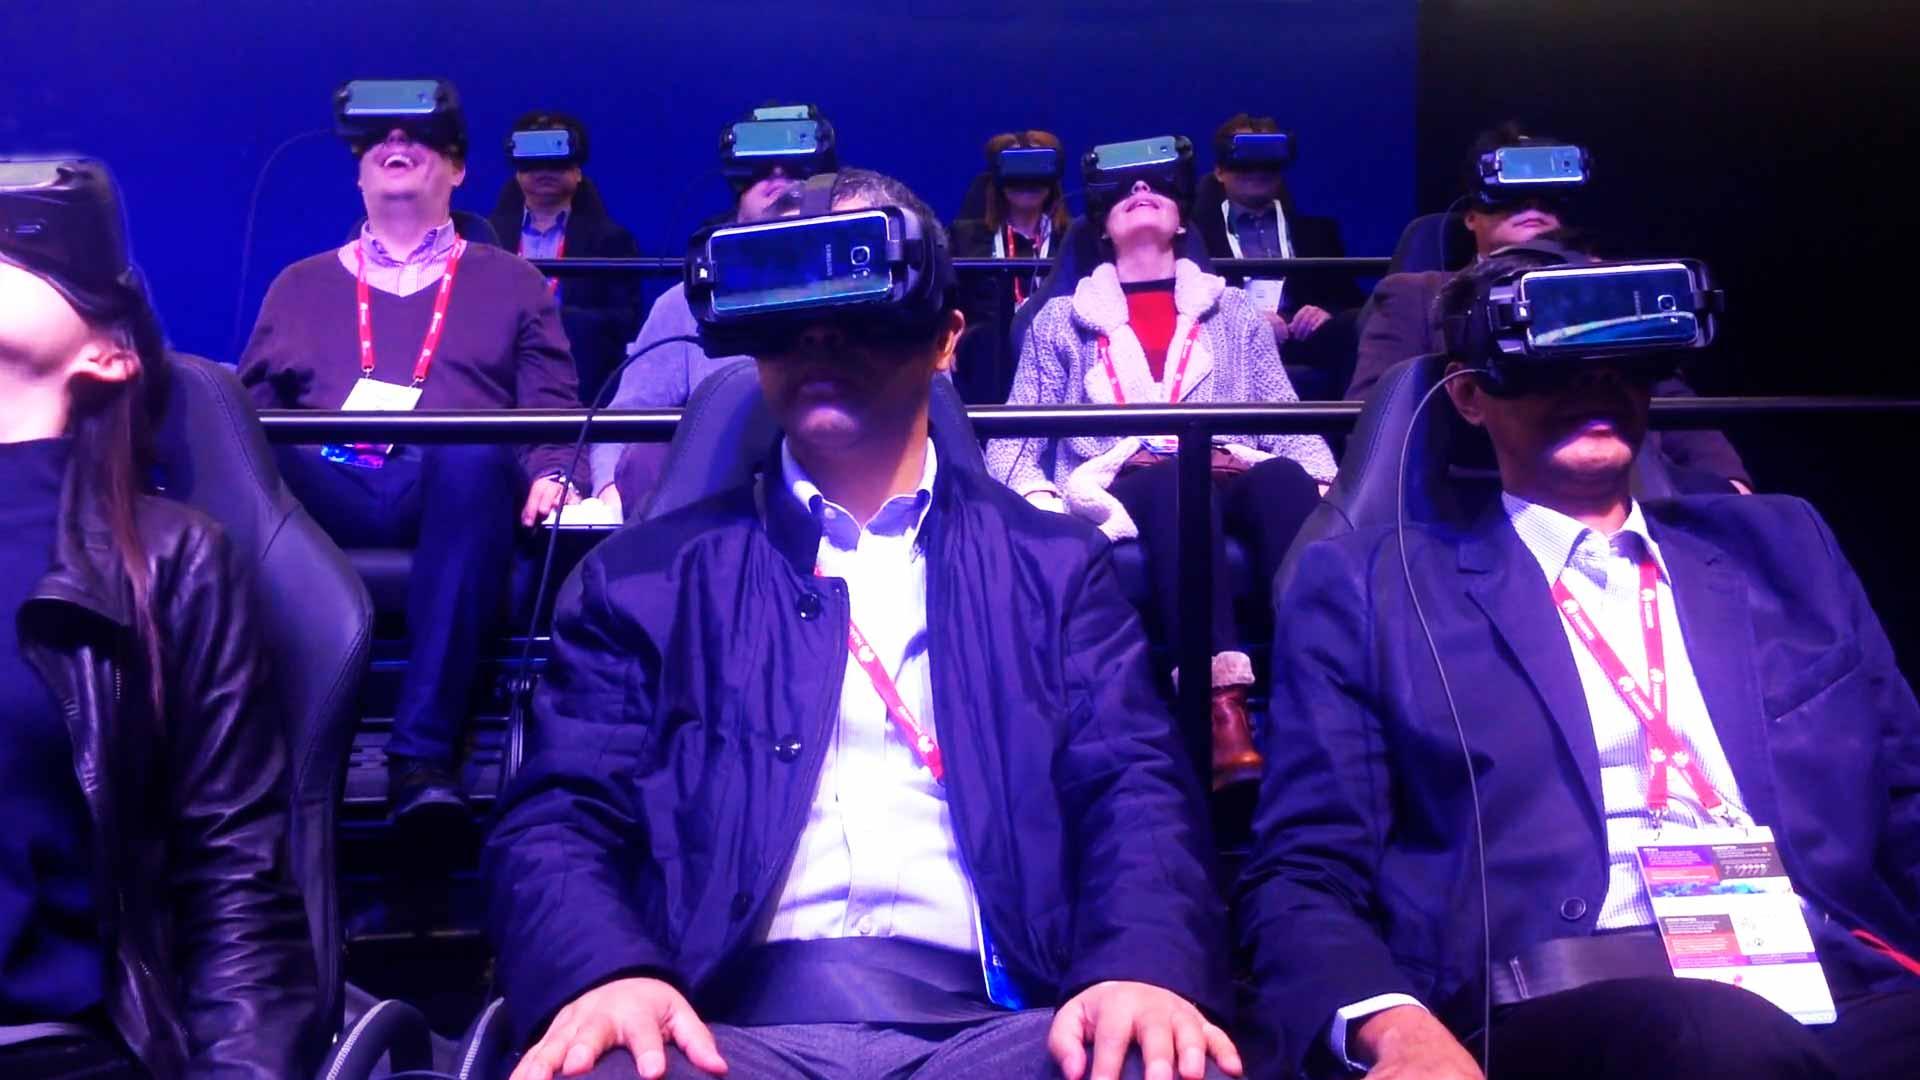 REALIDAD VIRTUAL 360 VR